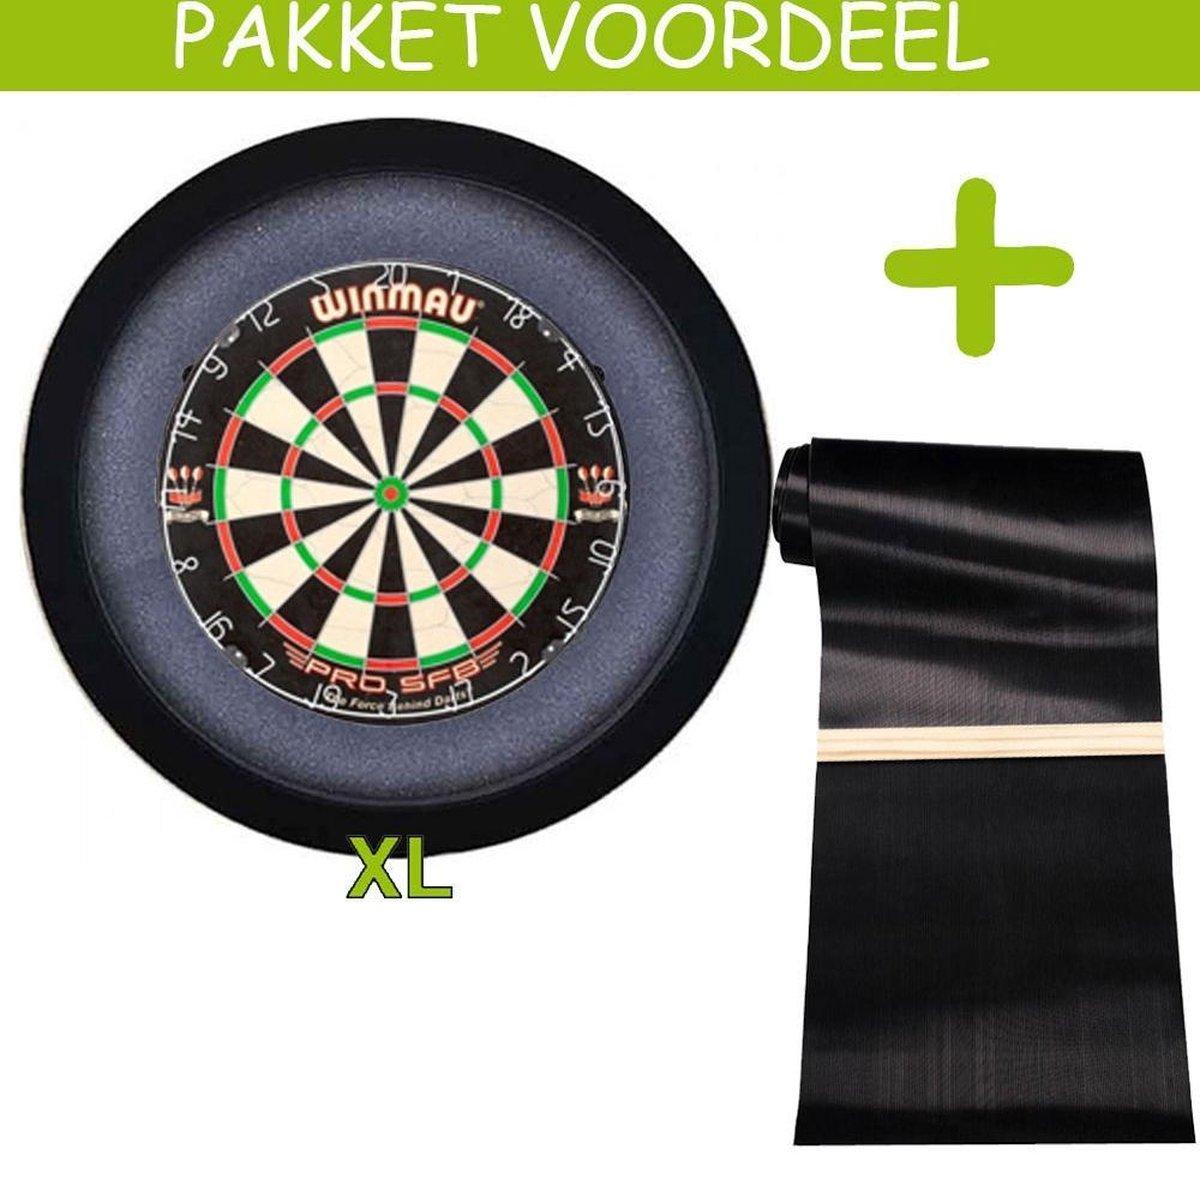 Dartbaan Pro - Pro SFB - 60 x 300 Inclusief Oche - Dartbordverlichting Basic XL - (Zwart)